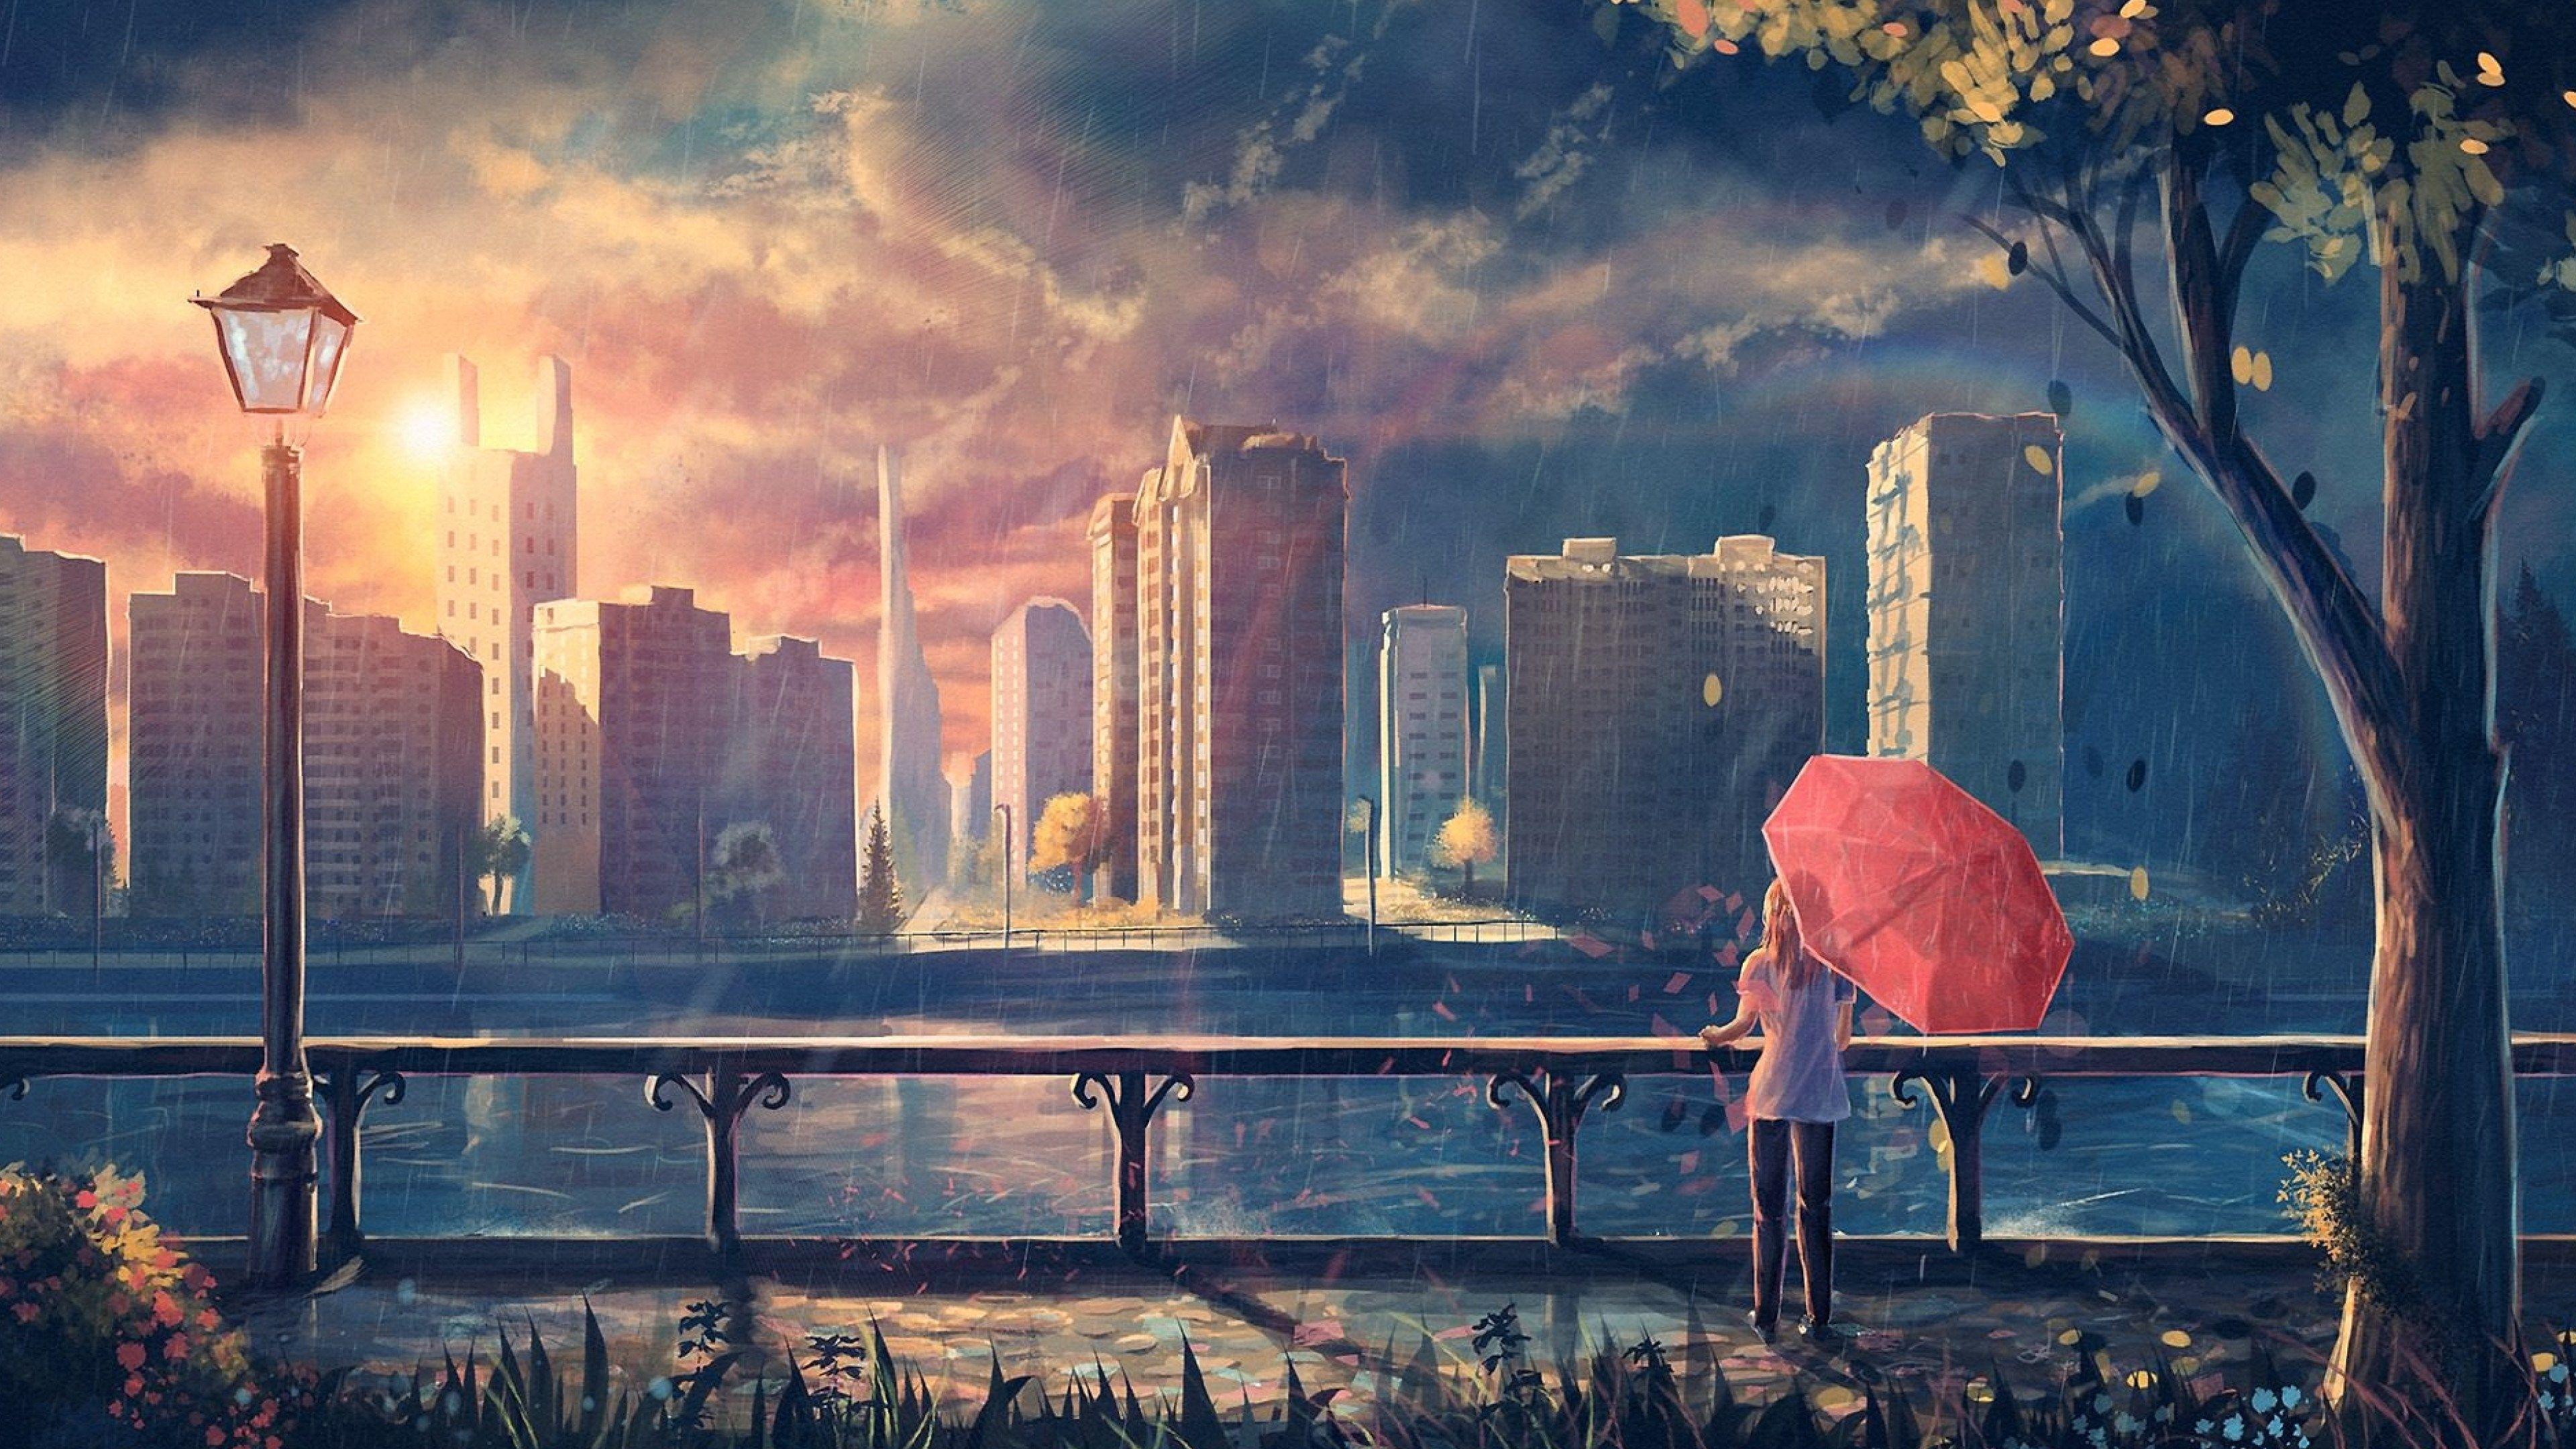 Wallpaper 4k Anime Girl Cityscape Umbrella Trees 4k 4k Wallpapers Anime Girl Wallpapers Anime Wallpapers Artist Wallpapers Artwork Wallpapers Digital Art Wallpapers Hd Wallpapers Rain Wallpapers Umbrella Wallpapers